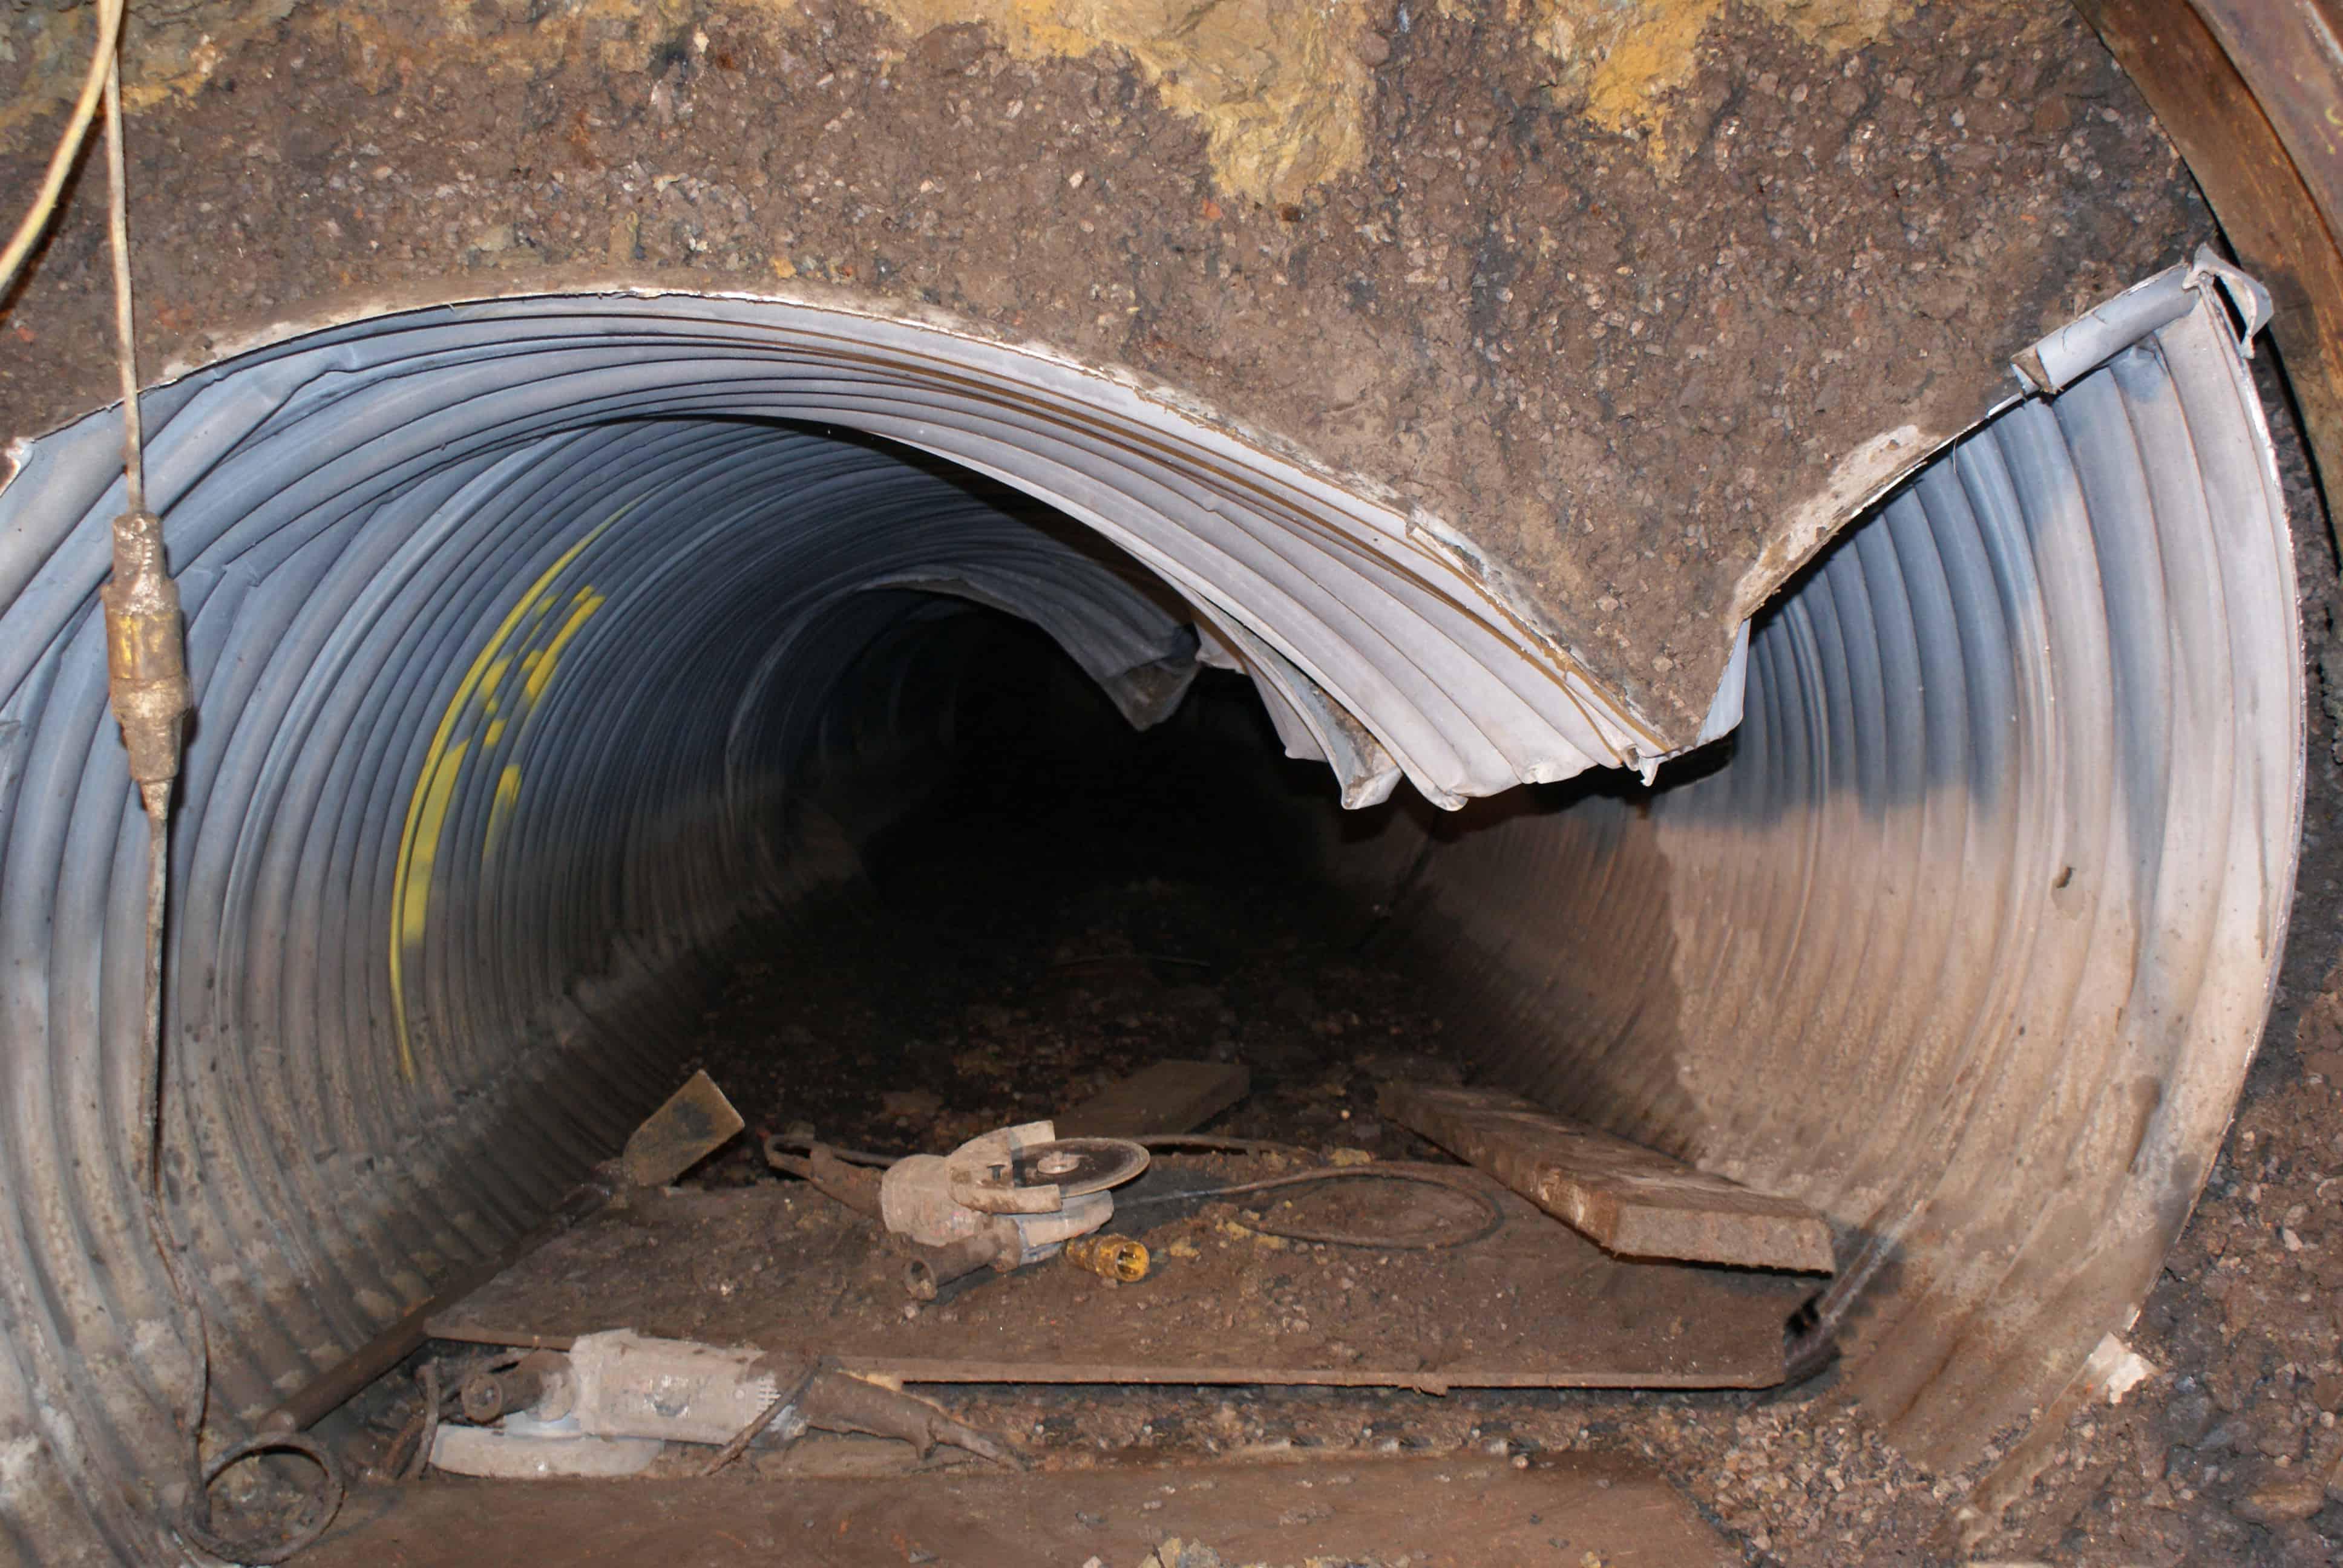 Pipe Jacking solution solves culvert collapse – UKDN Waterflow